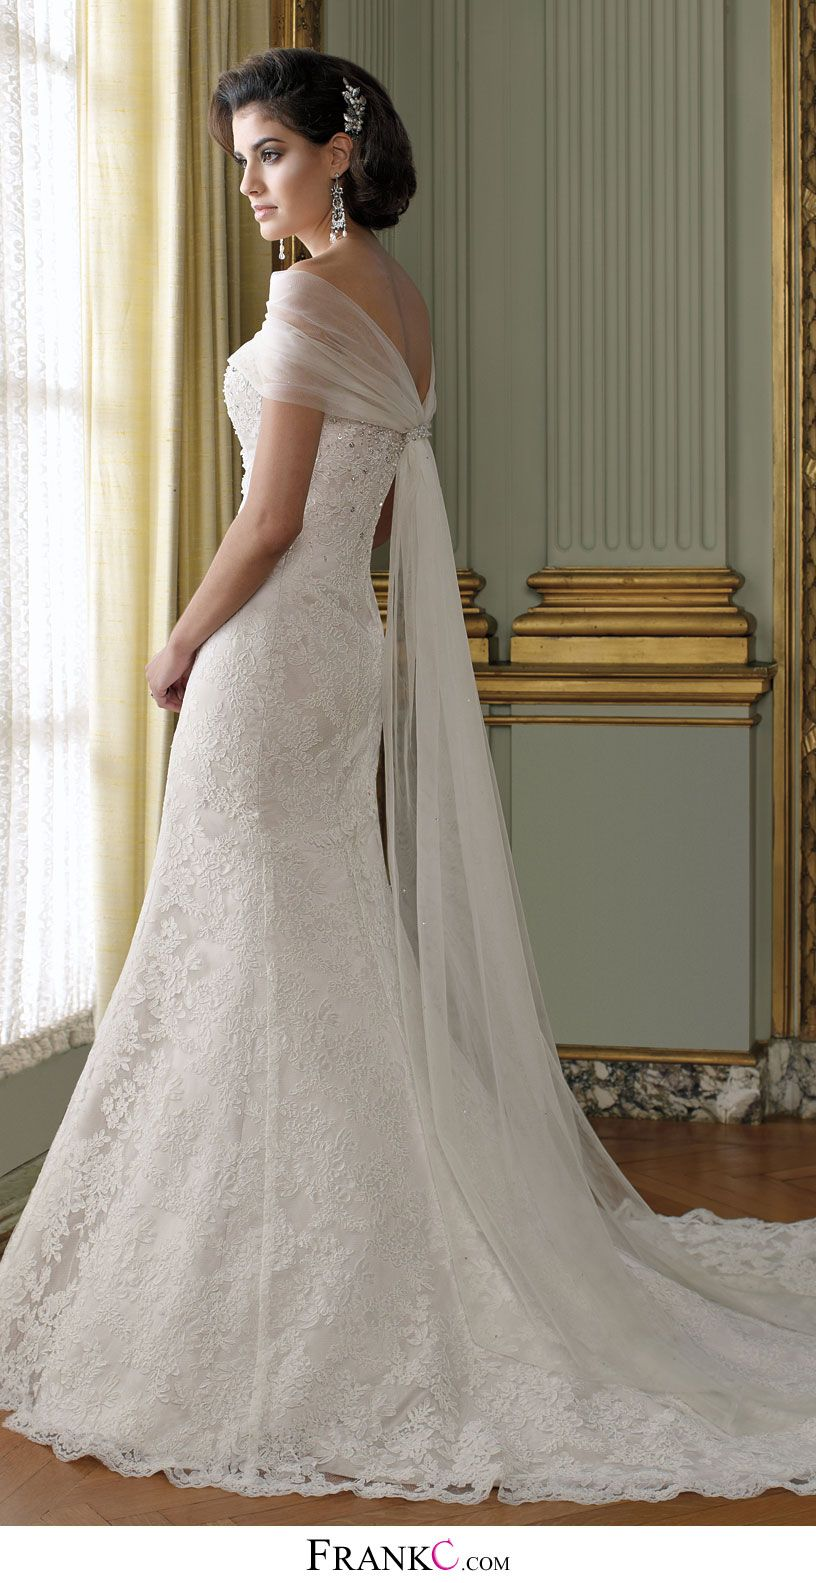 White mermaid wedding dress  mermaid wedding dresslace wedding dresswedding dress  Wedding